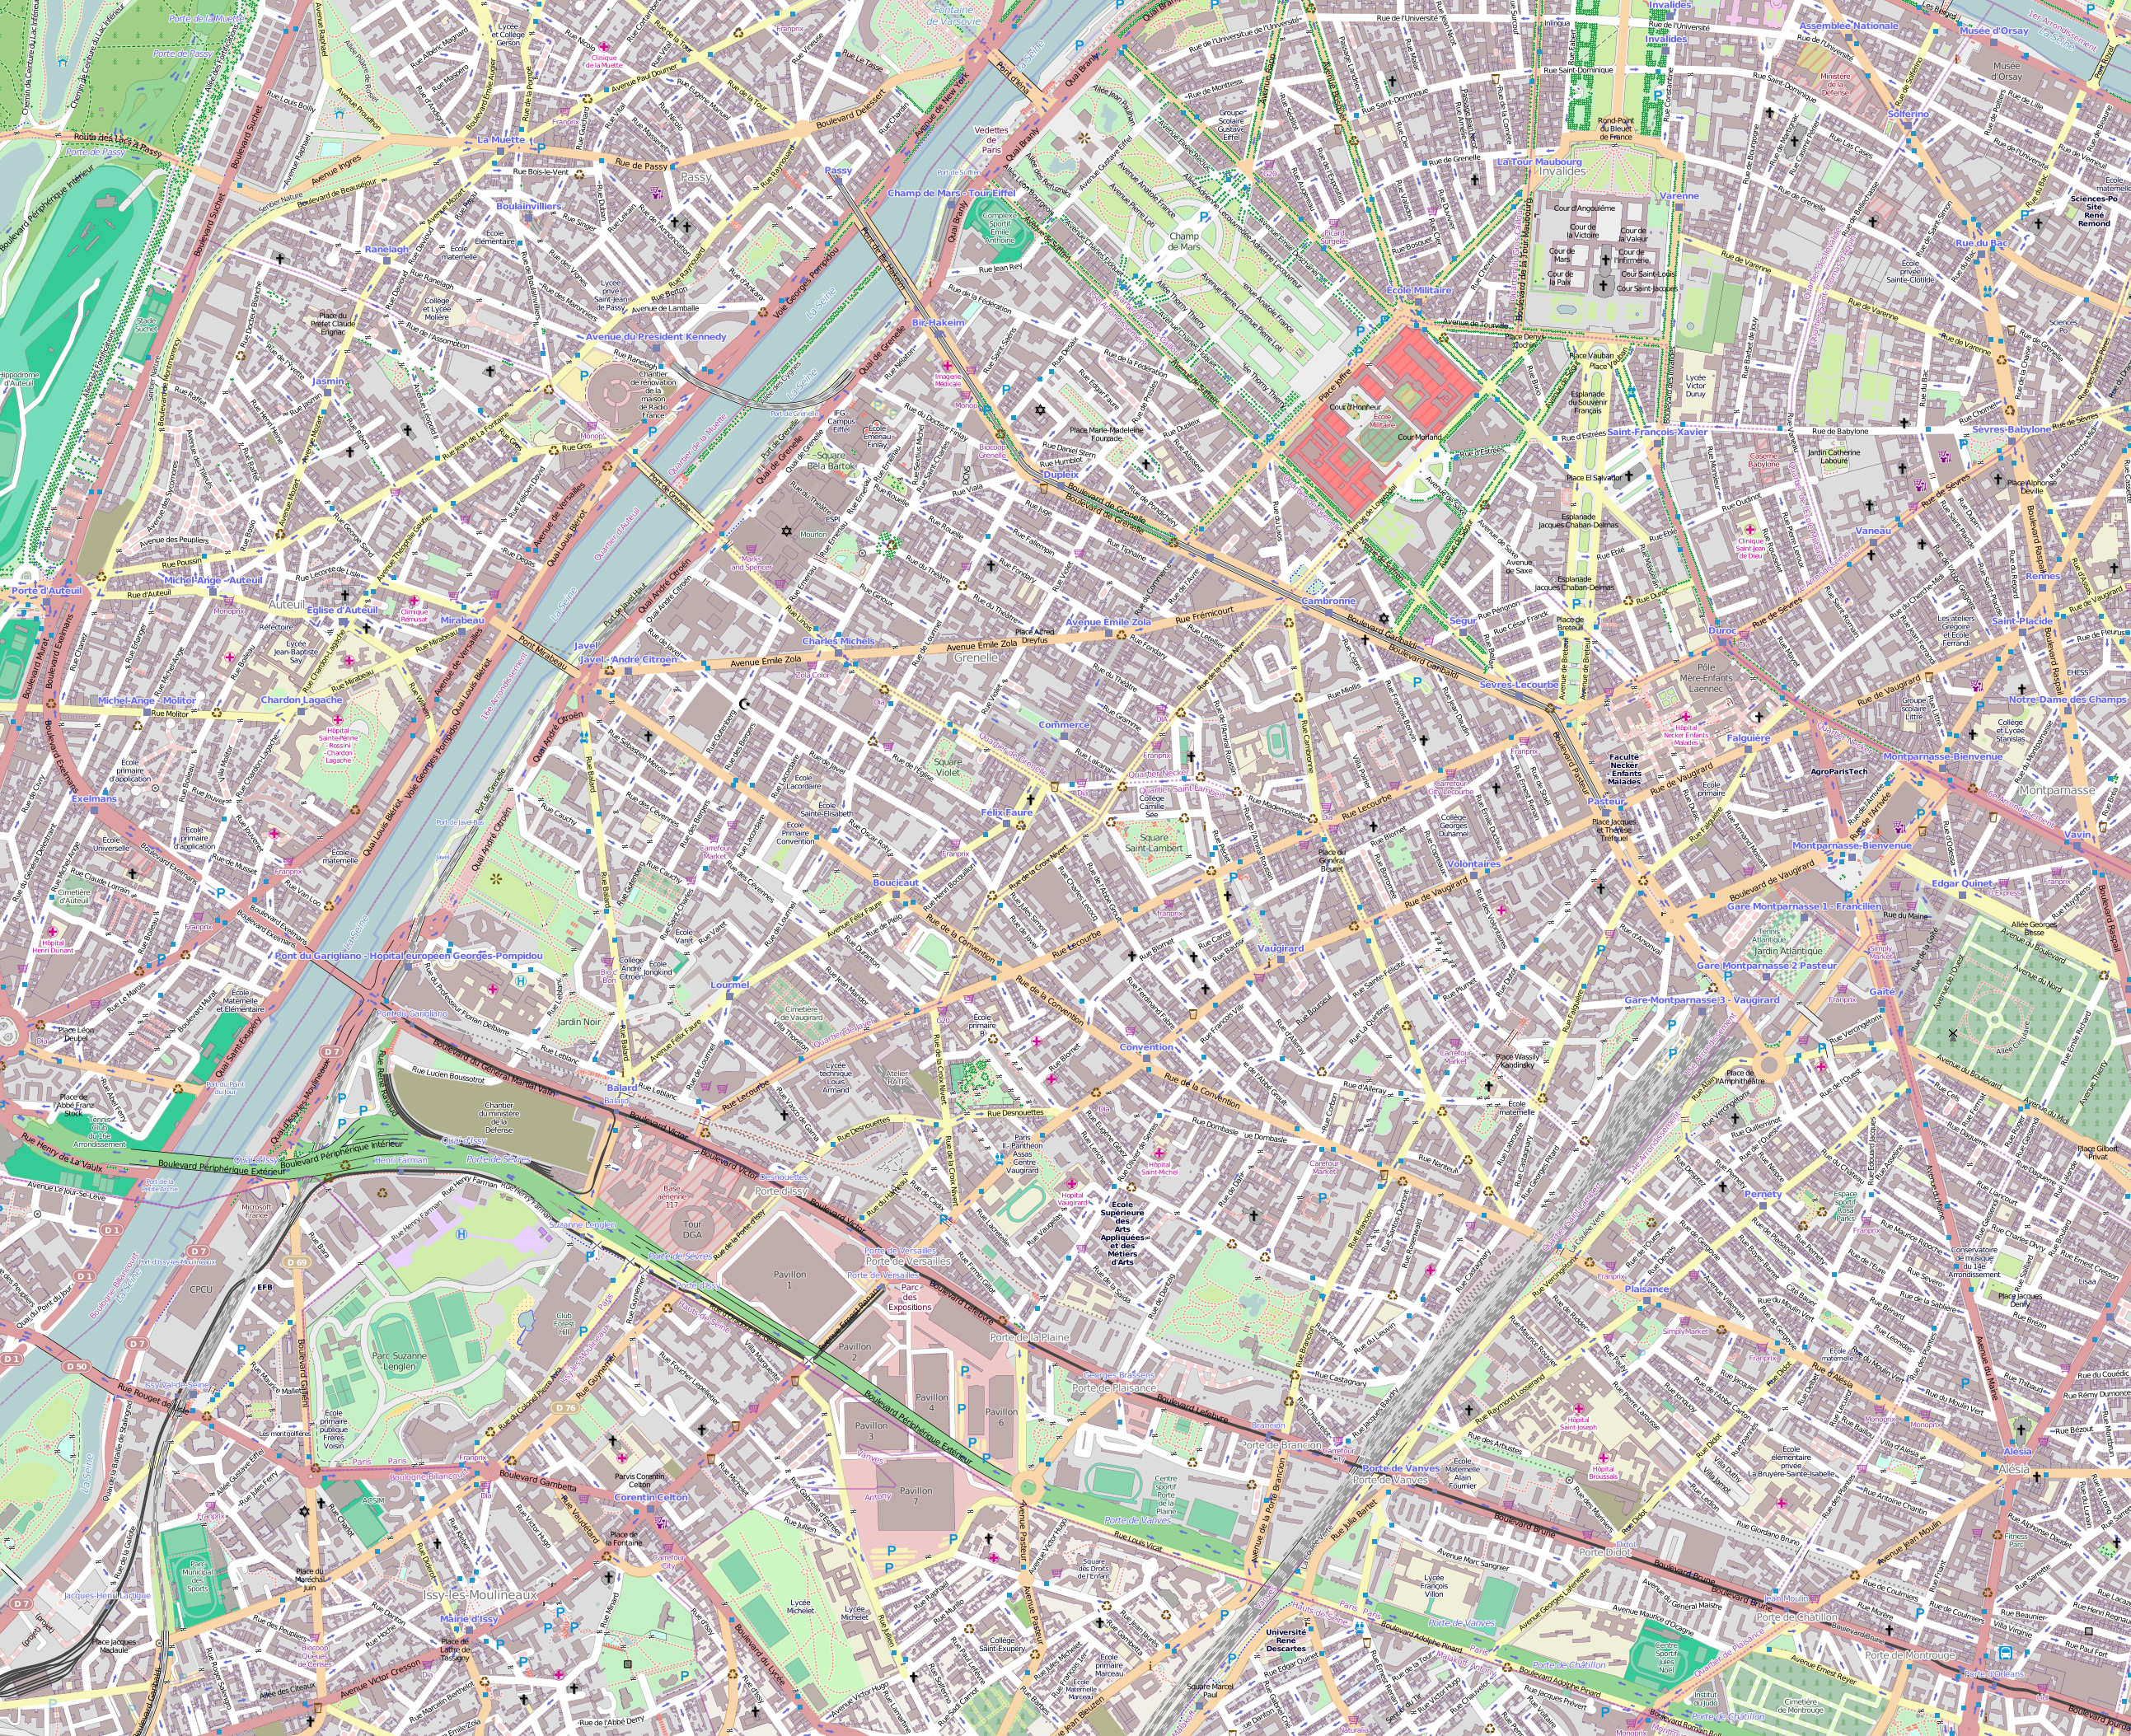 Maps Update 14001035 Street Map of Paris Arrondissements Map – Streetmap France